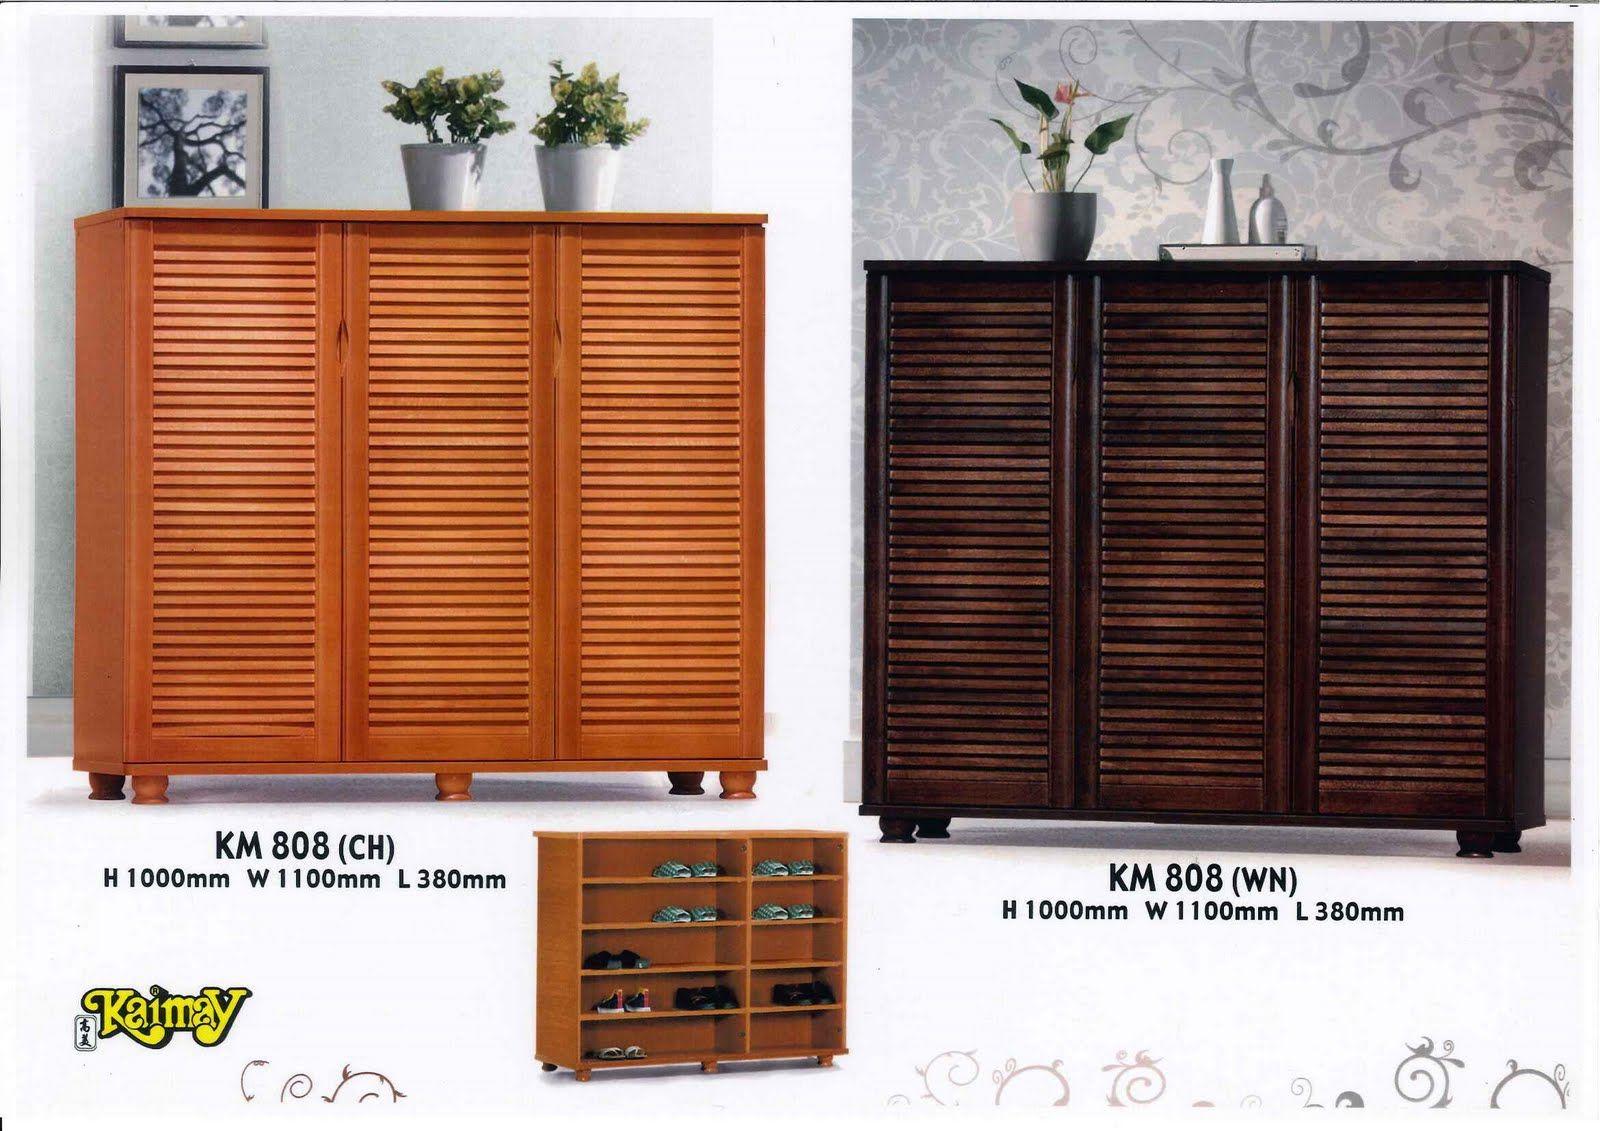 Decorative Shoe Storage Cabinets » Photo 1093